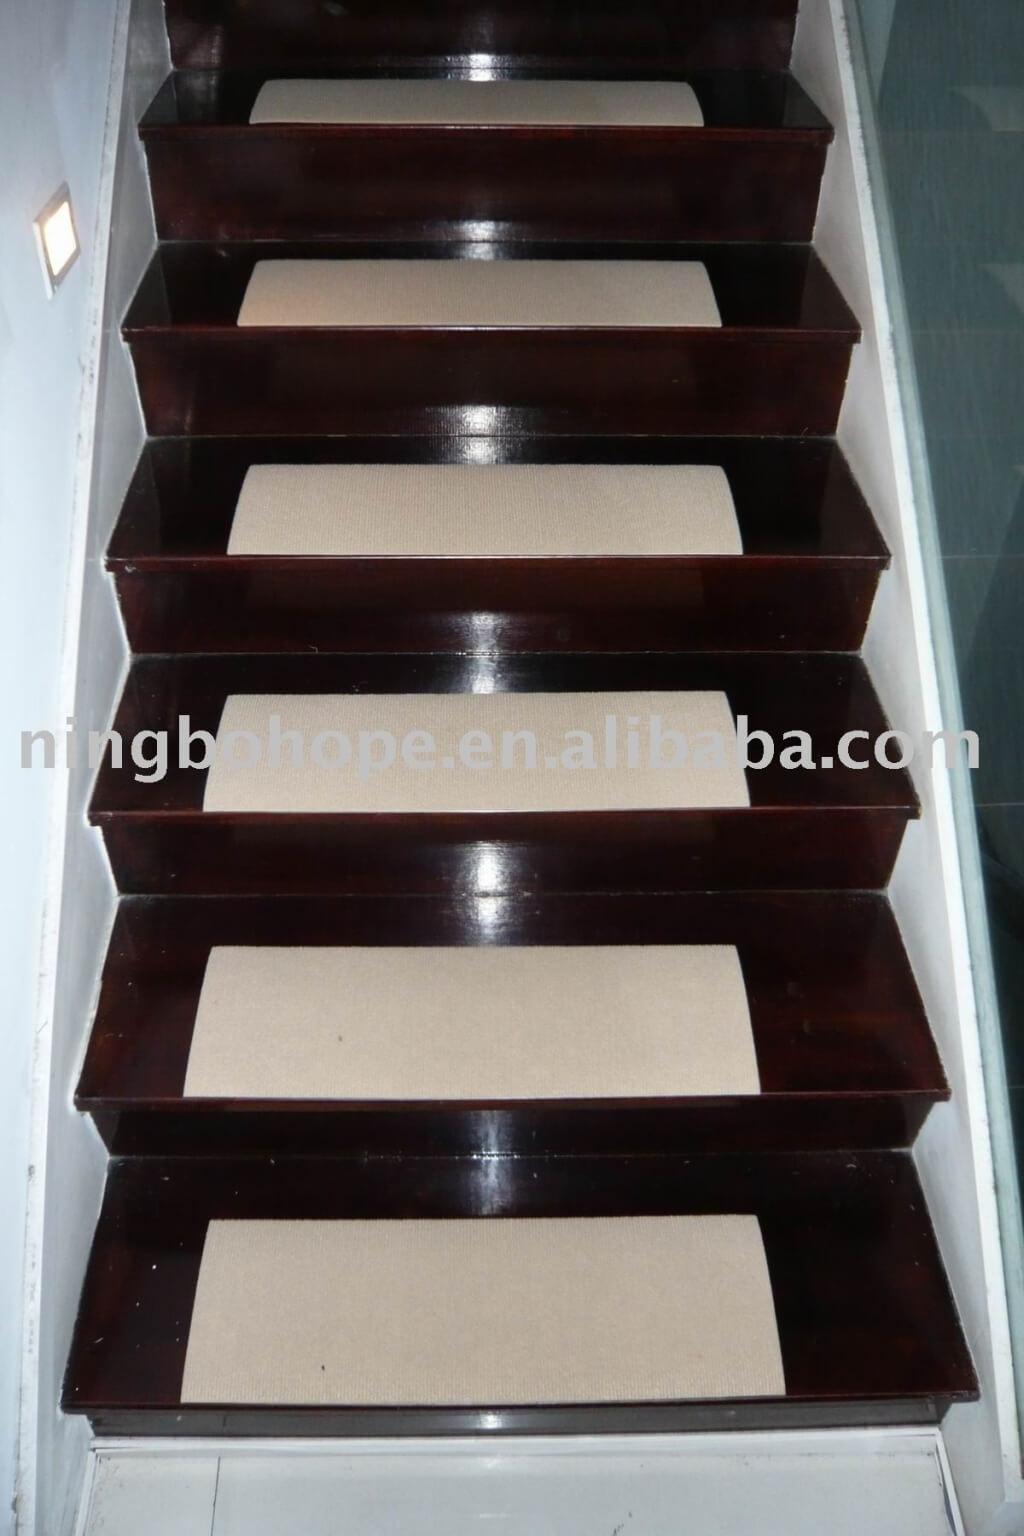 Flooring Flexible Carpet Non Slip Stair Treads Non Slip Rubber Inside Non Slip Carpet Stair Treads Indoor (#6 of 20)